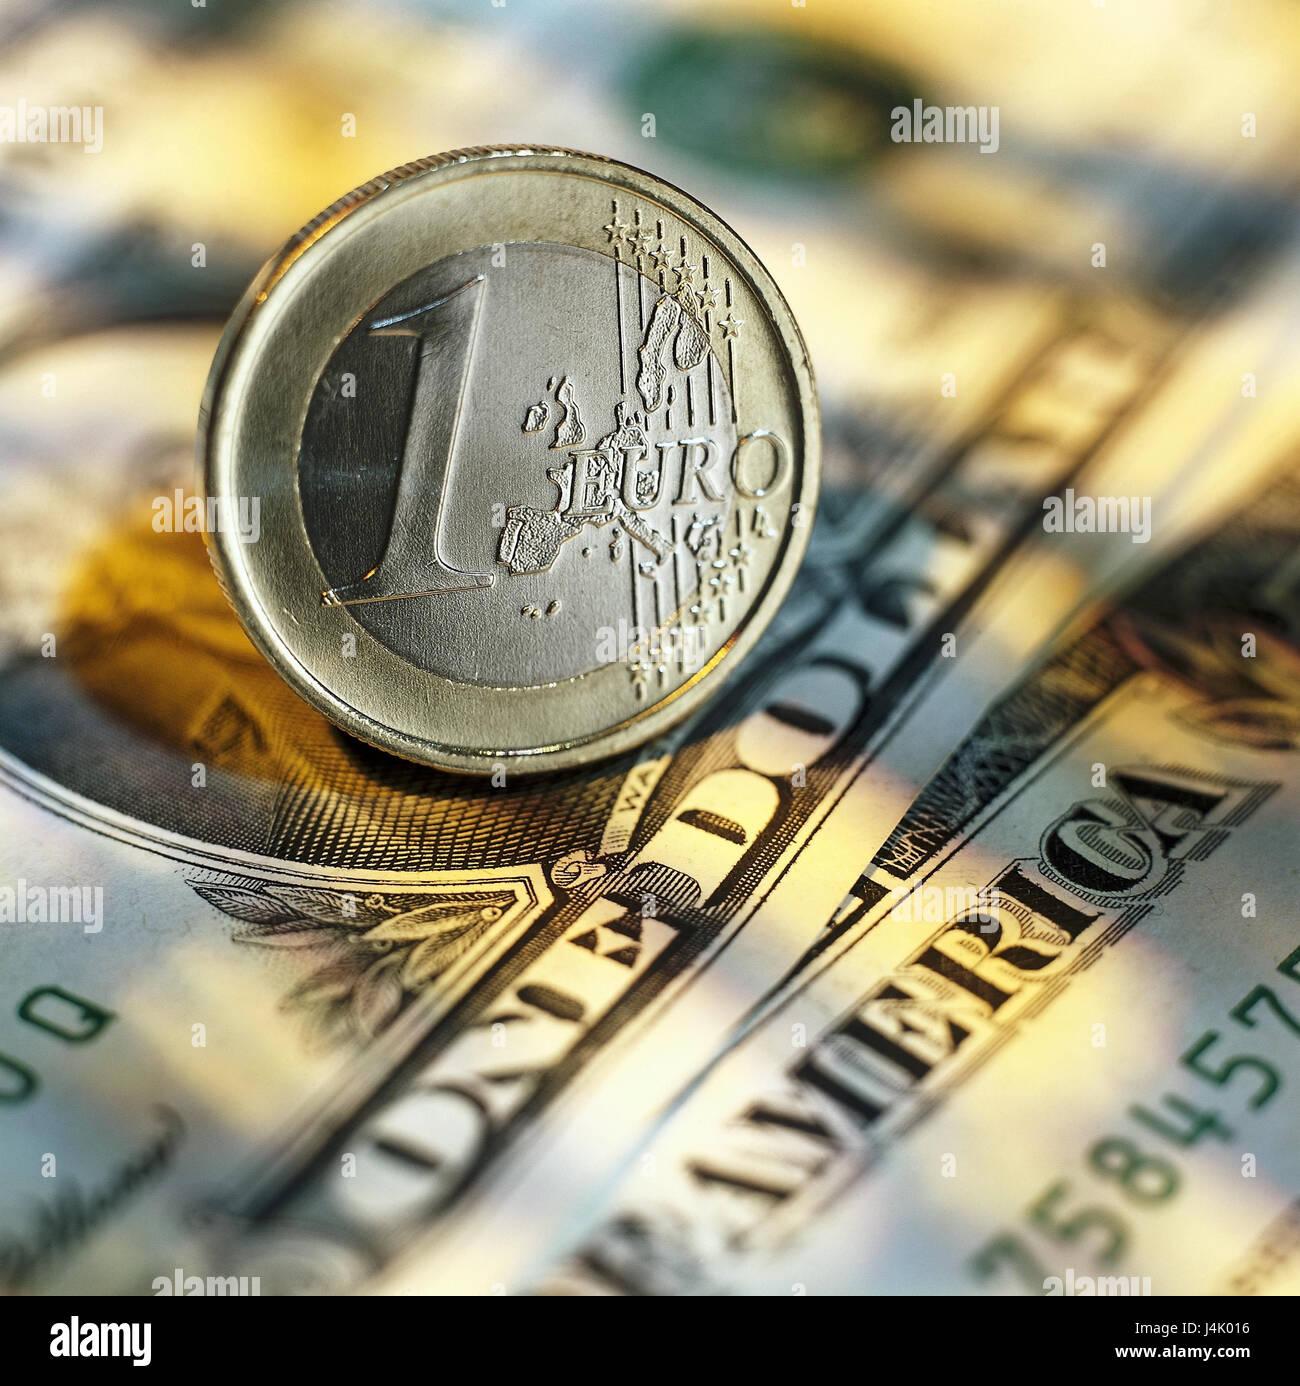 Europe Bank Of America Stock Photos & Europe Bank Of America